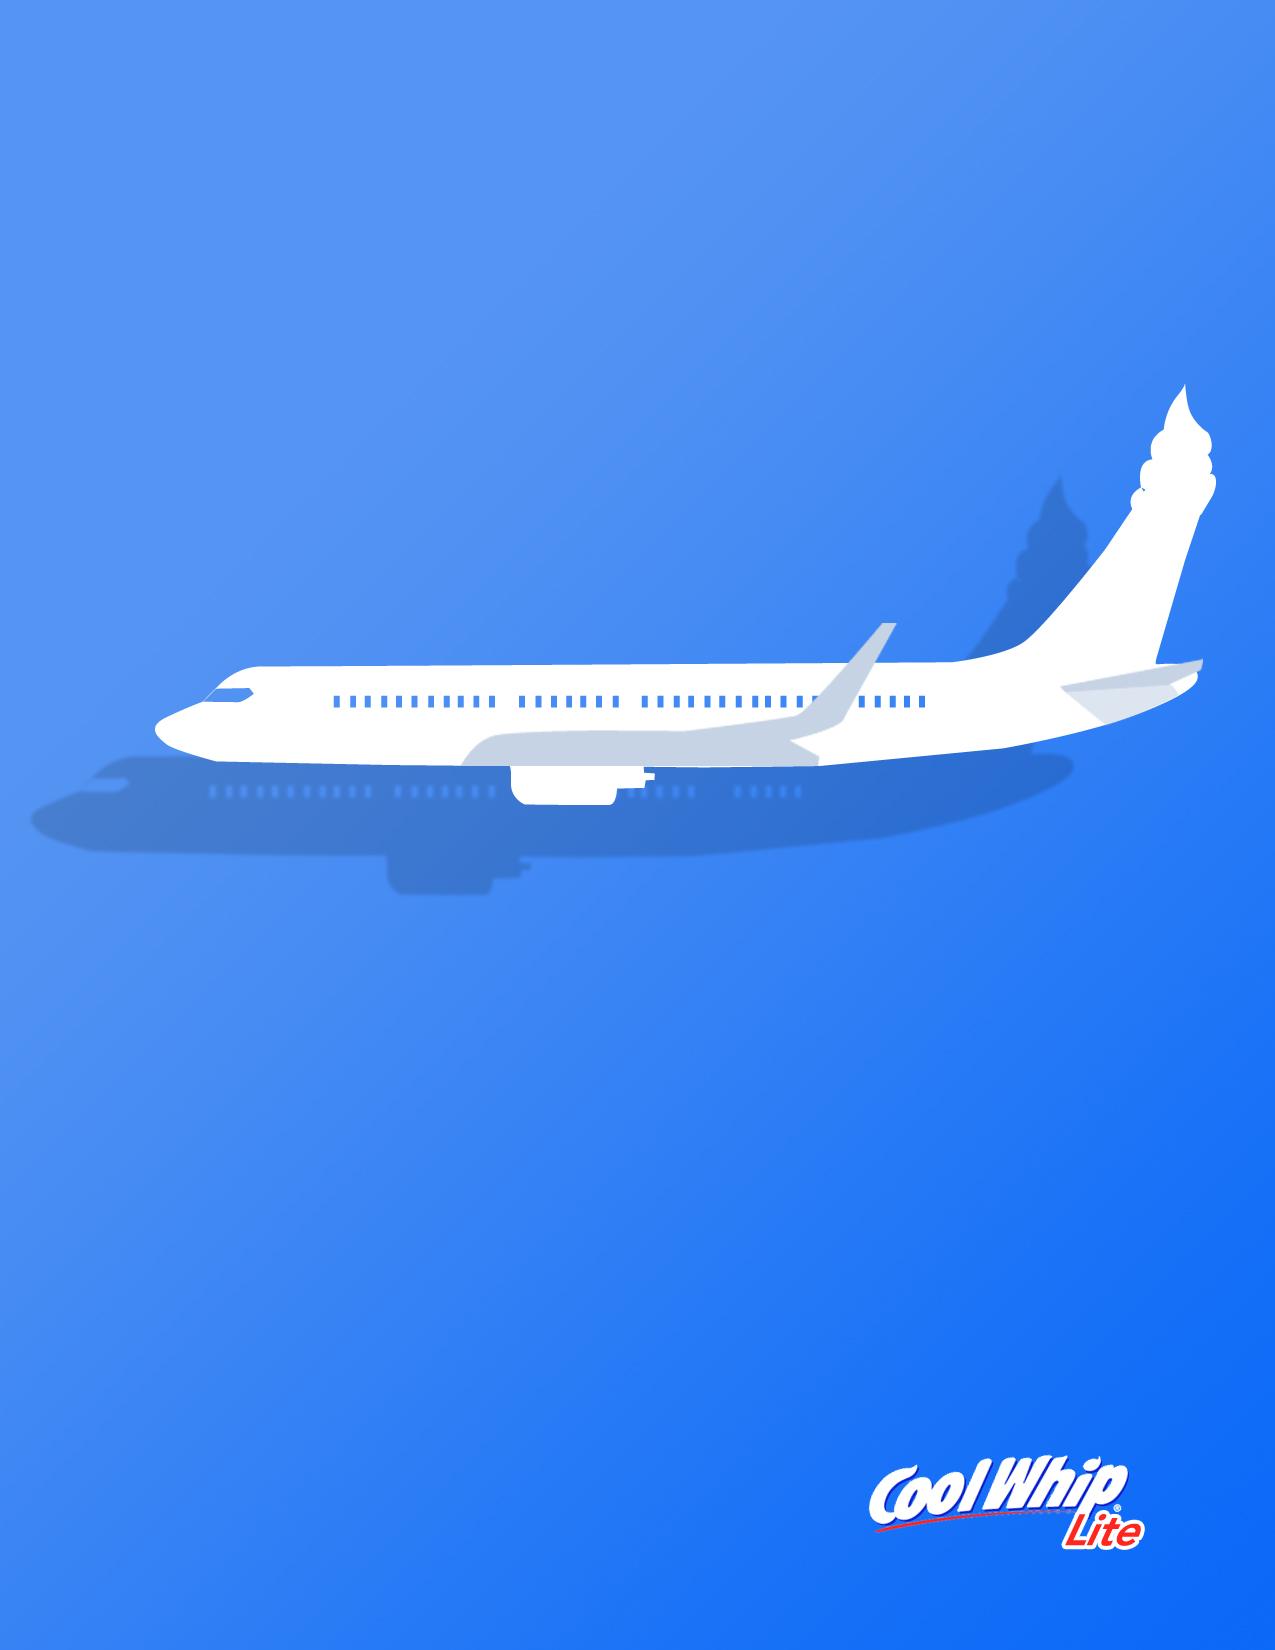 CoolWhip_plane.jpg